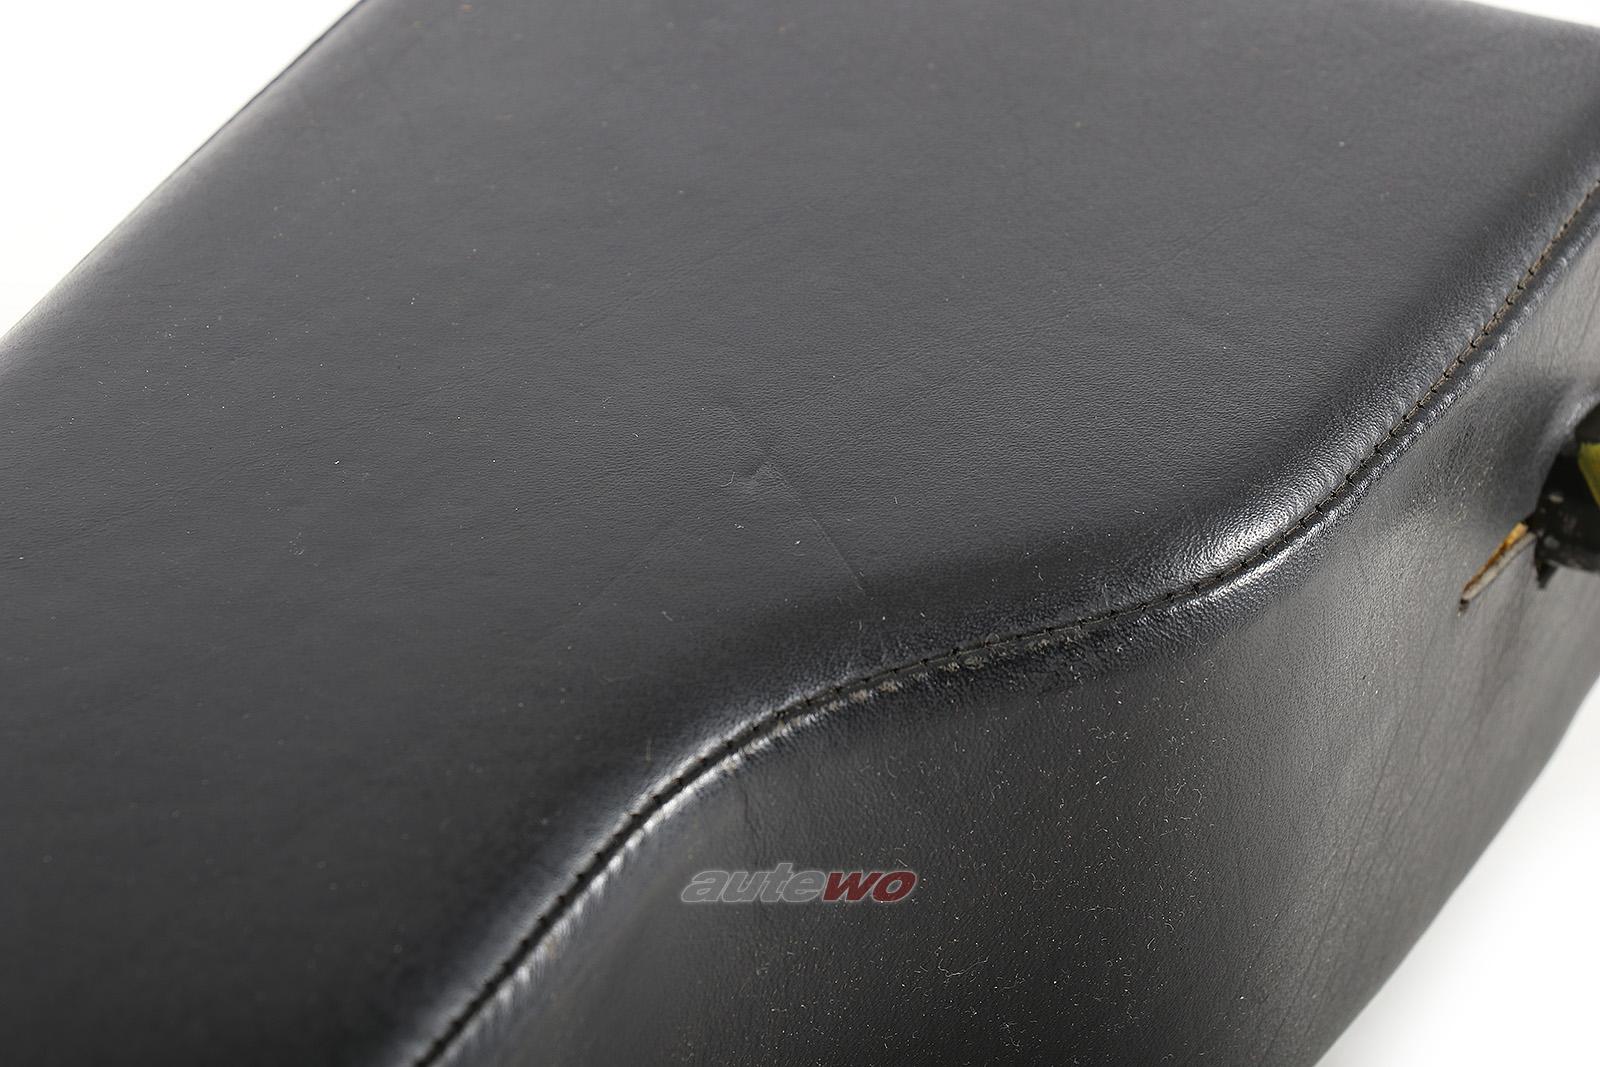 443881751B Audi 100/200 Typ 44/C4/V8 D11 Leder-Mittelarmlehne schwarz